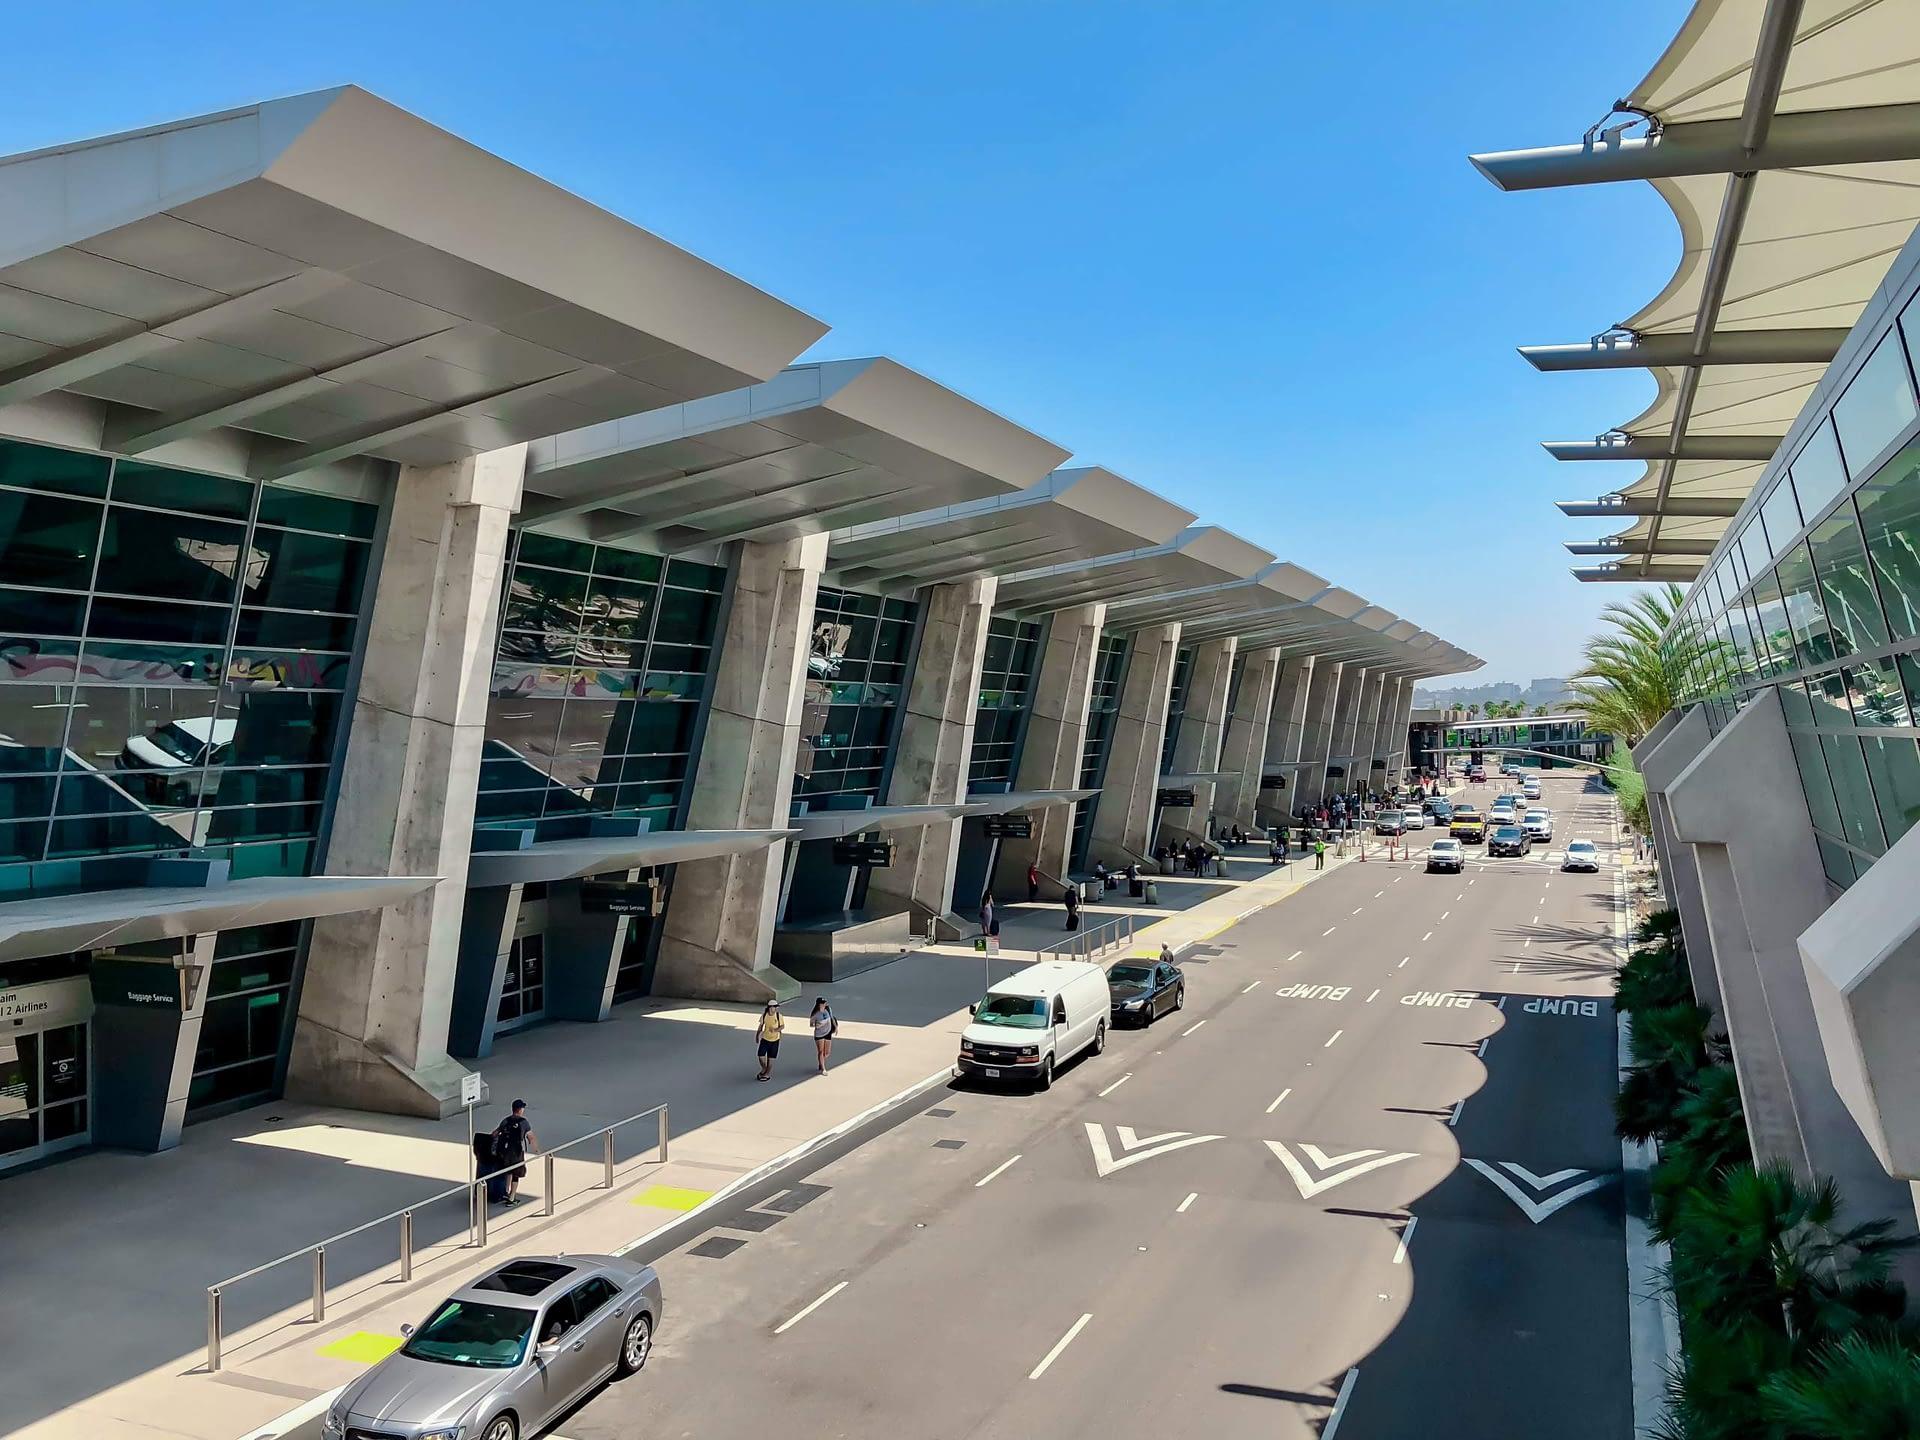 San Diego International Airport Goes Green